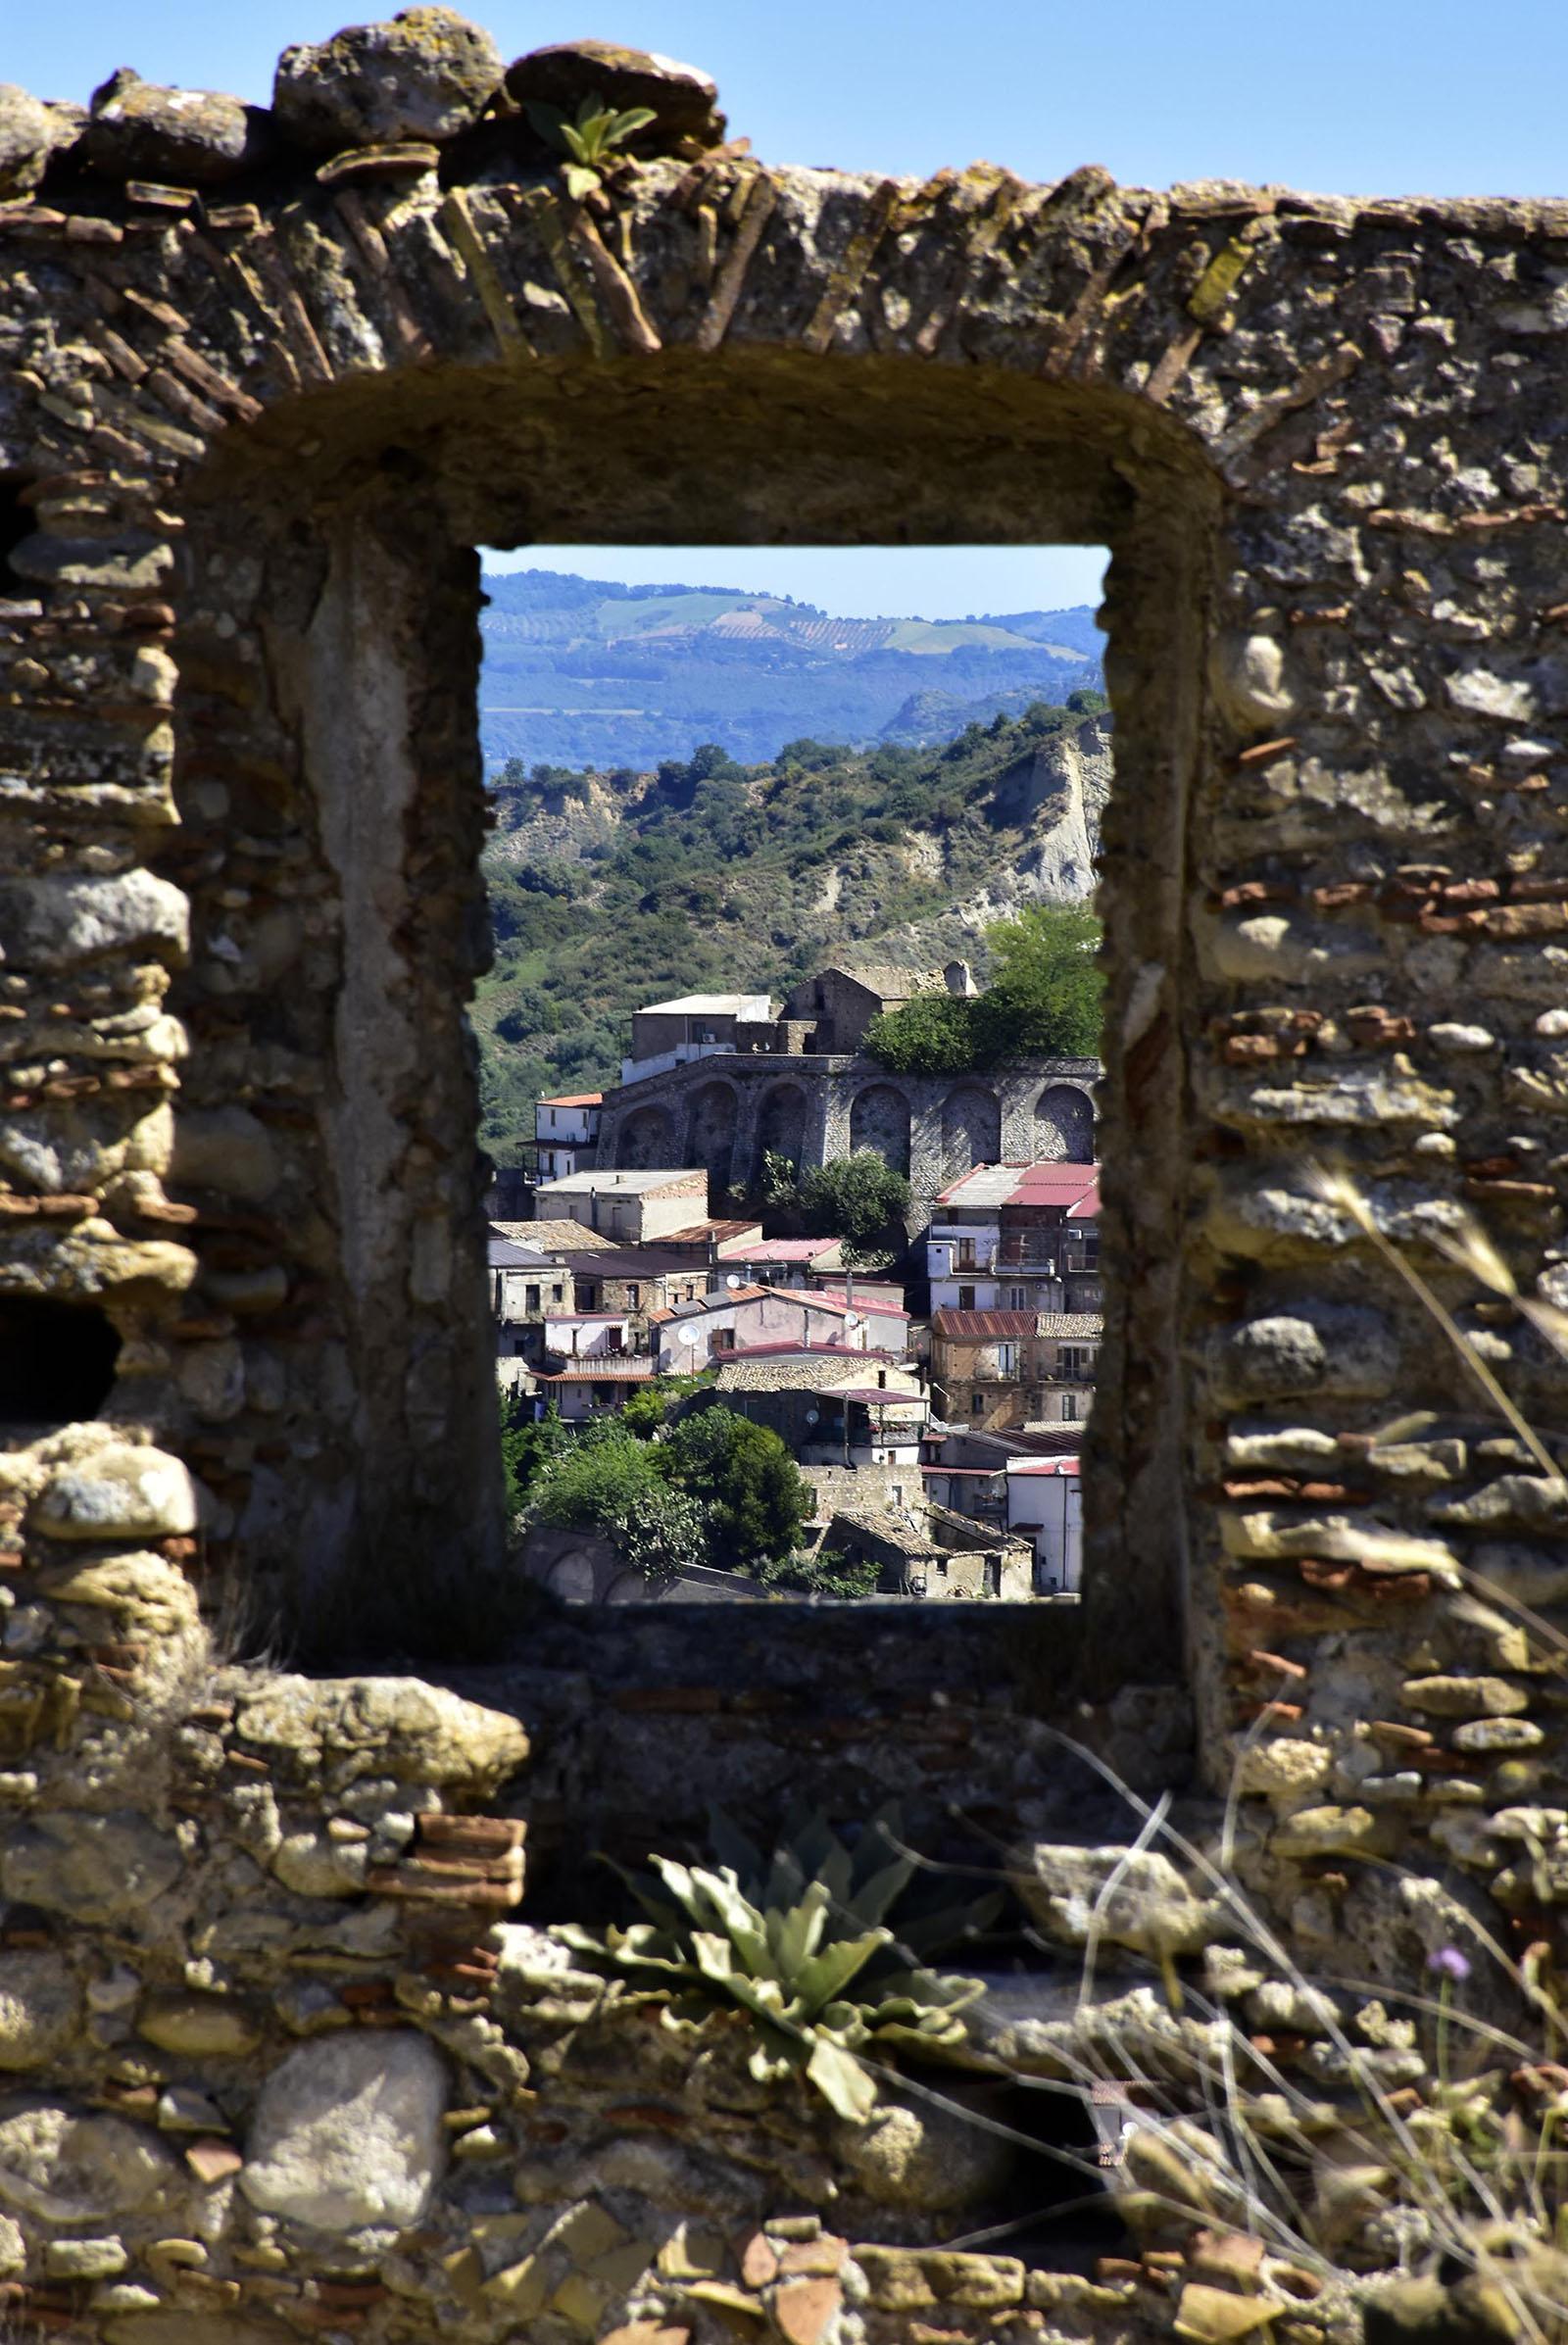 Vista su Roccabelarda  da finestra del Convento